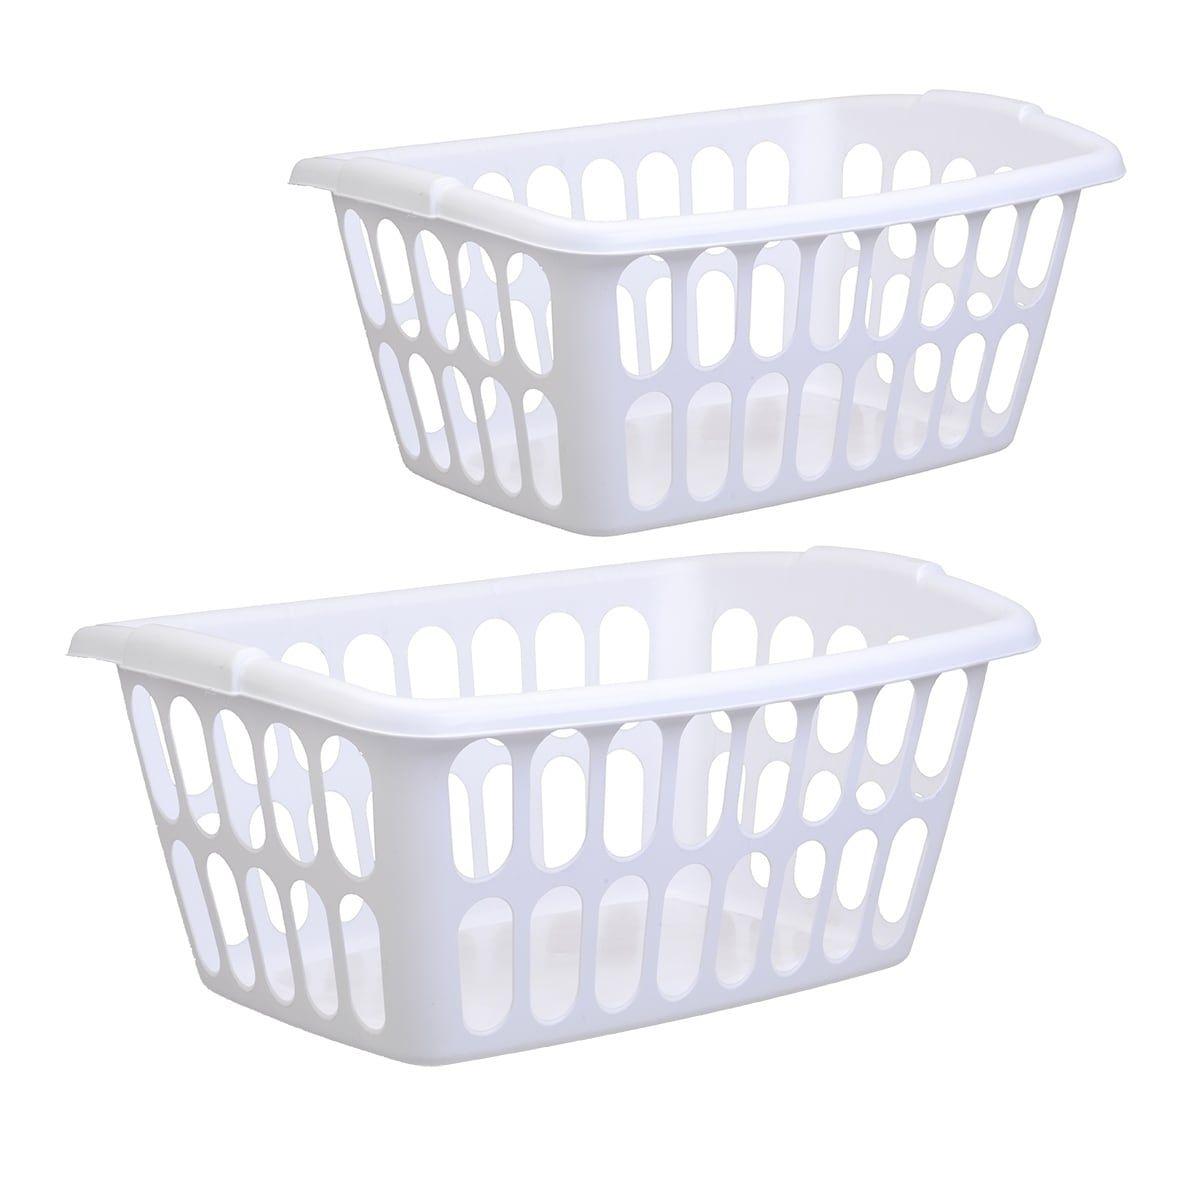 Online Shopping Bedding Furniture Electronics Jewelry Clothing More Laundry Basket Plastic Laundry Basket